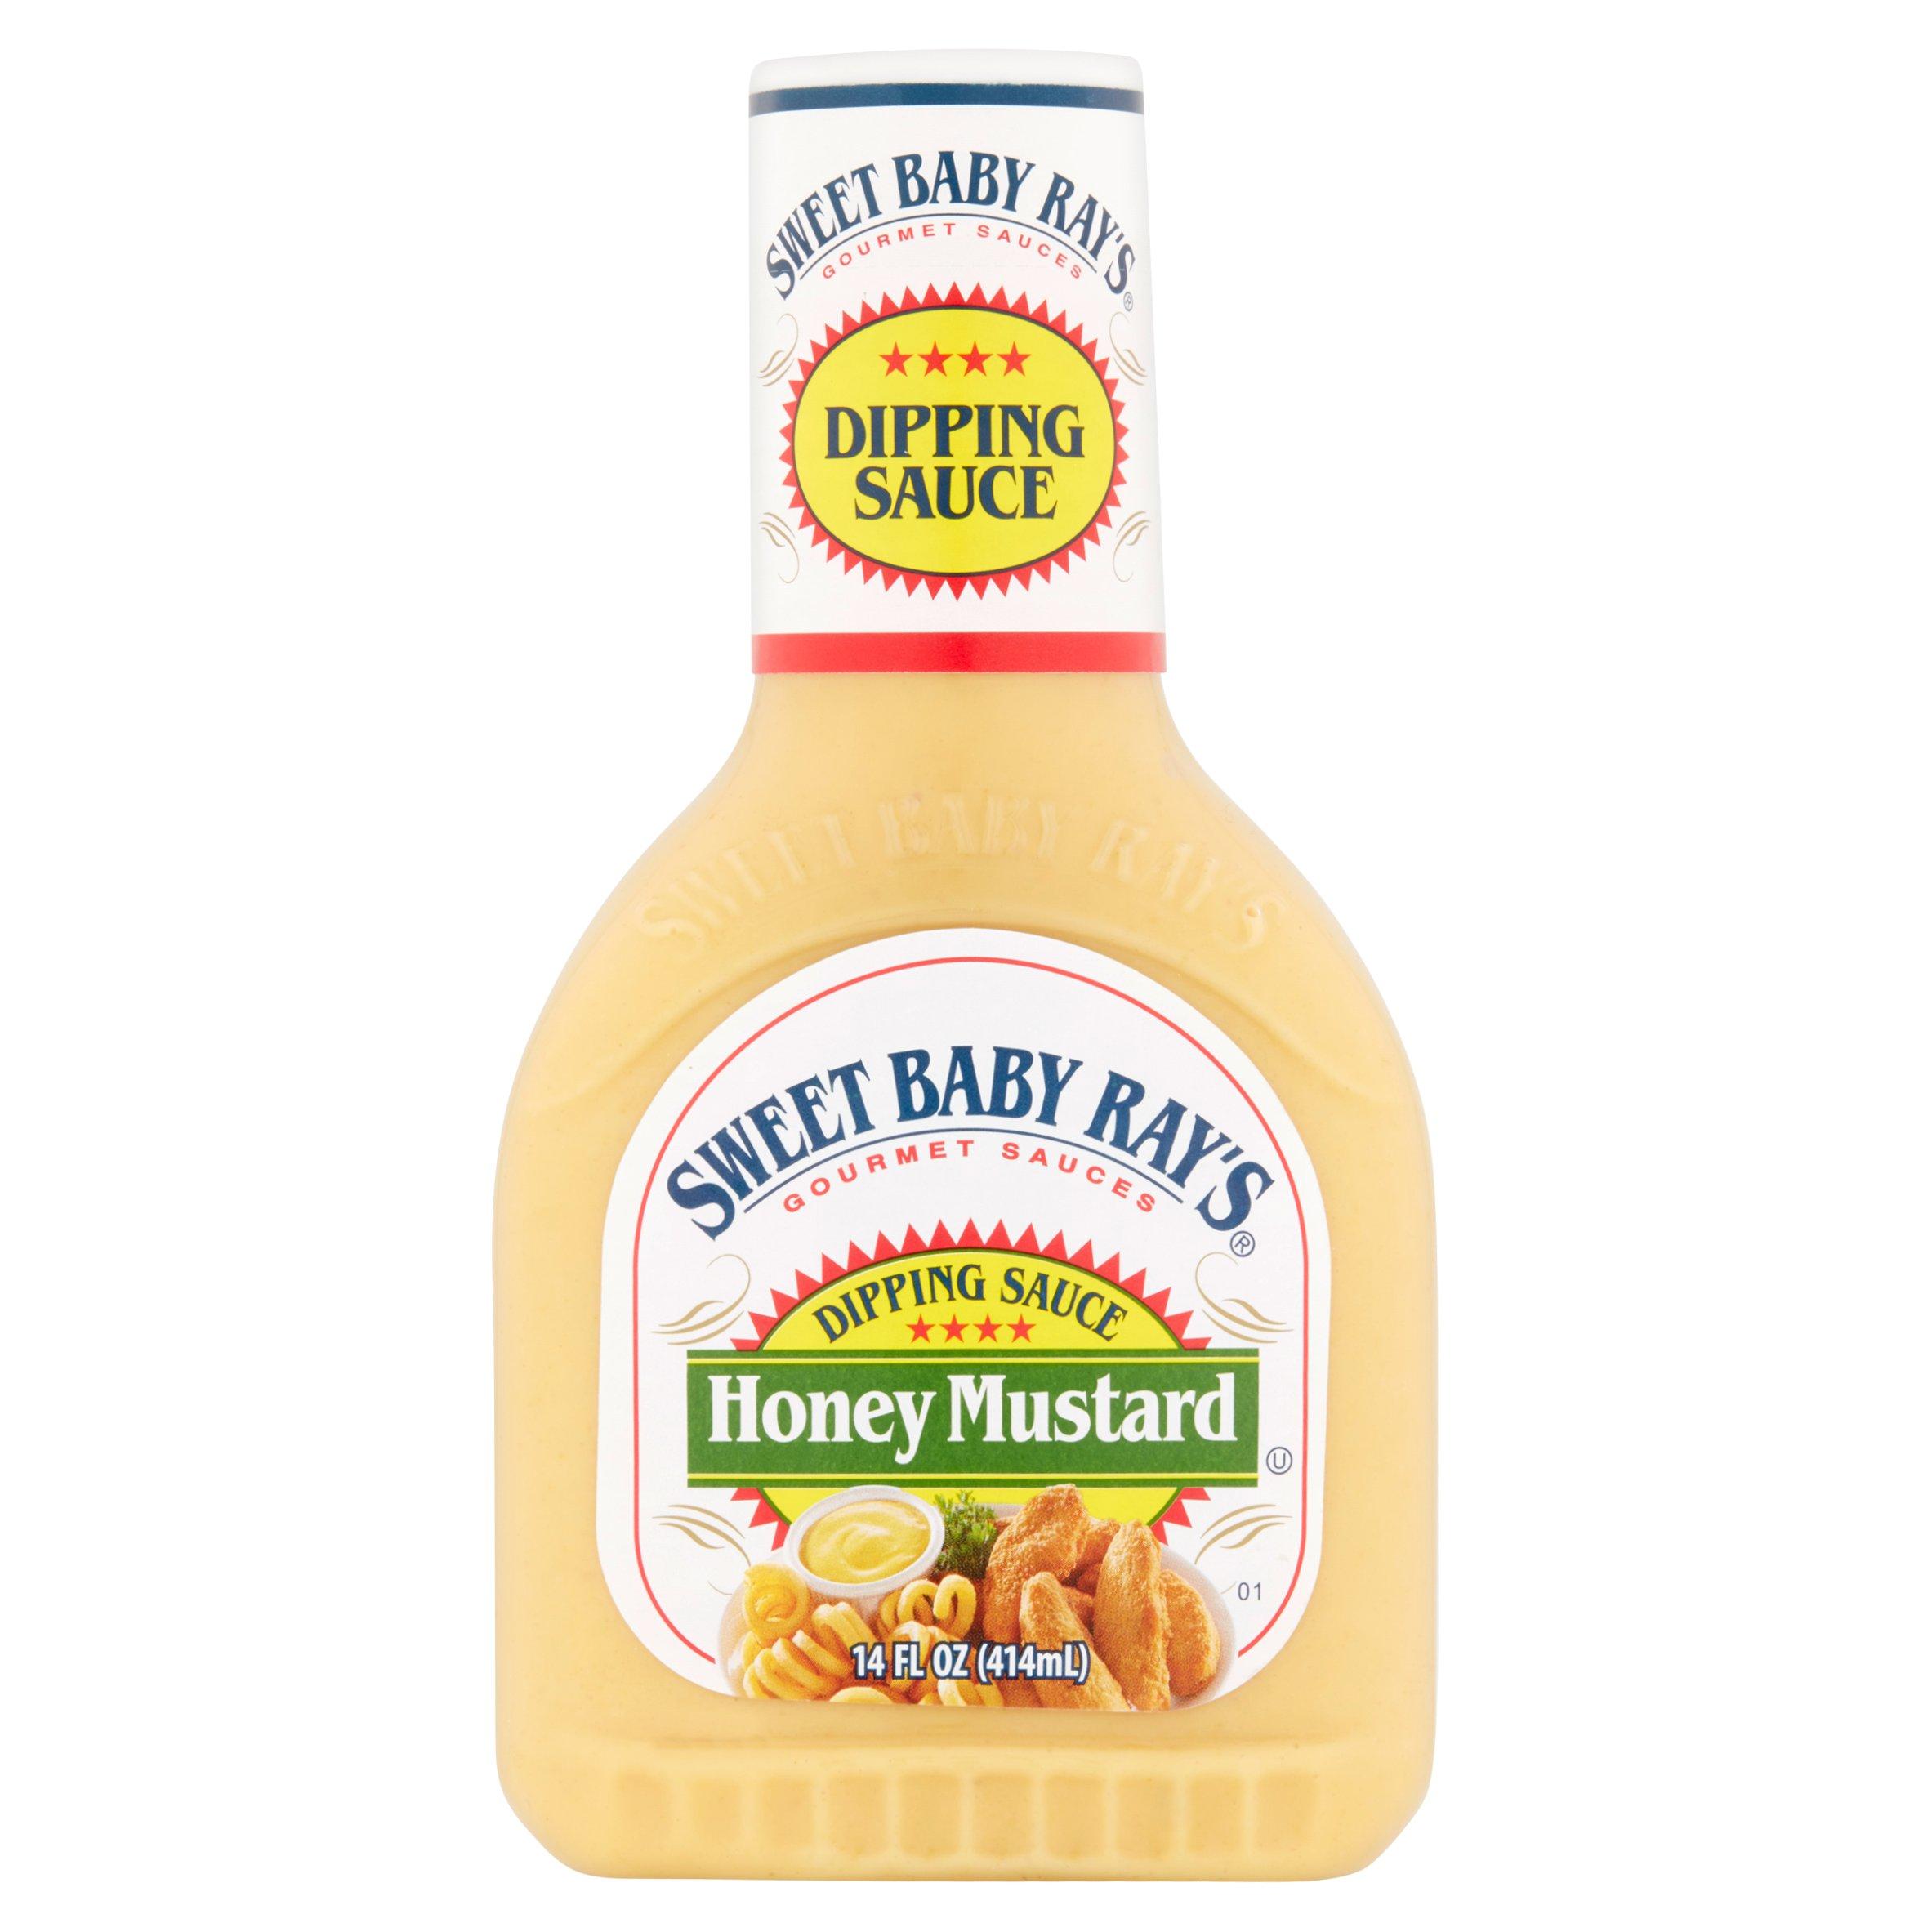 Sweet Baby Ray's Honey Mustard Dipping Sauce (Pack Of 3) 14 Oz Bottles